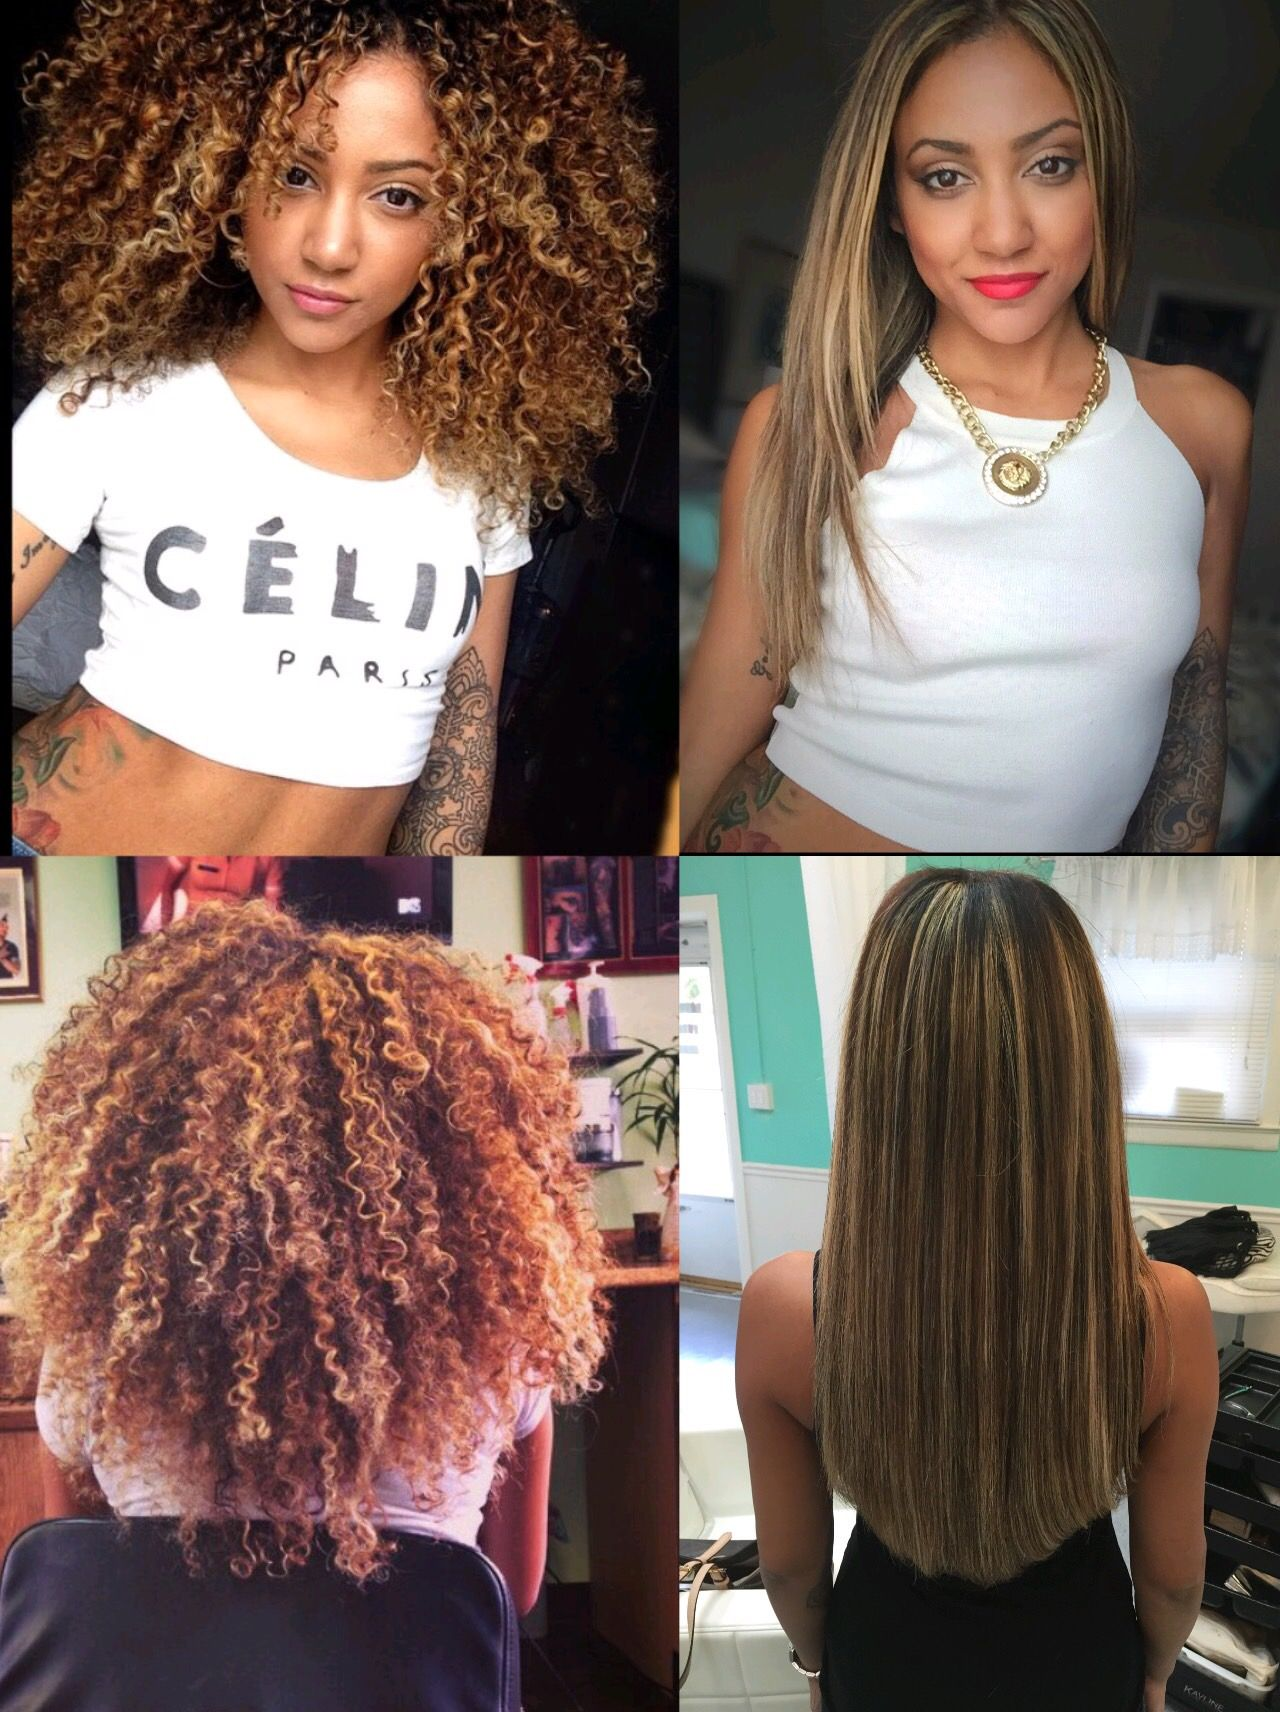 Curly Vs Straight Ig Tiffanytattooz Curly Vs Straight Hair Curly To Straight Hair Natural Hair Woman